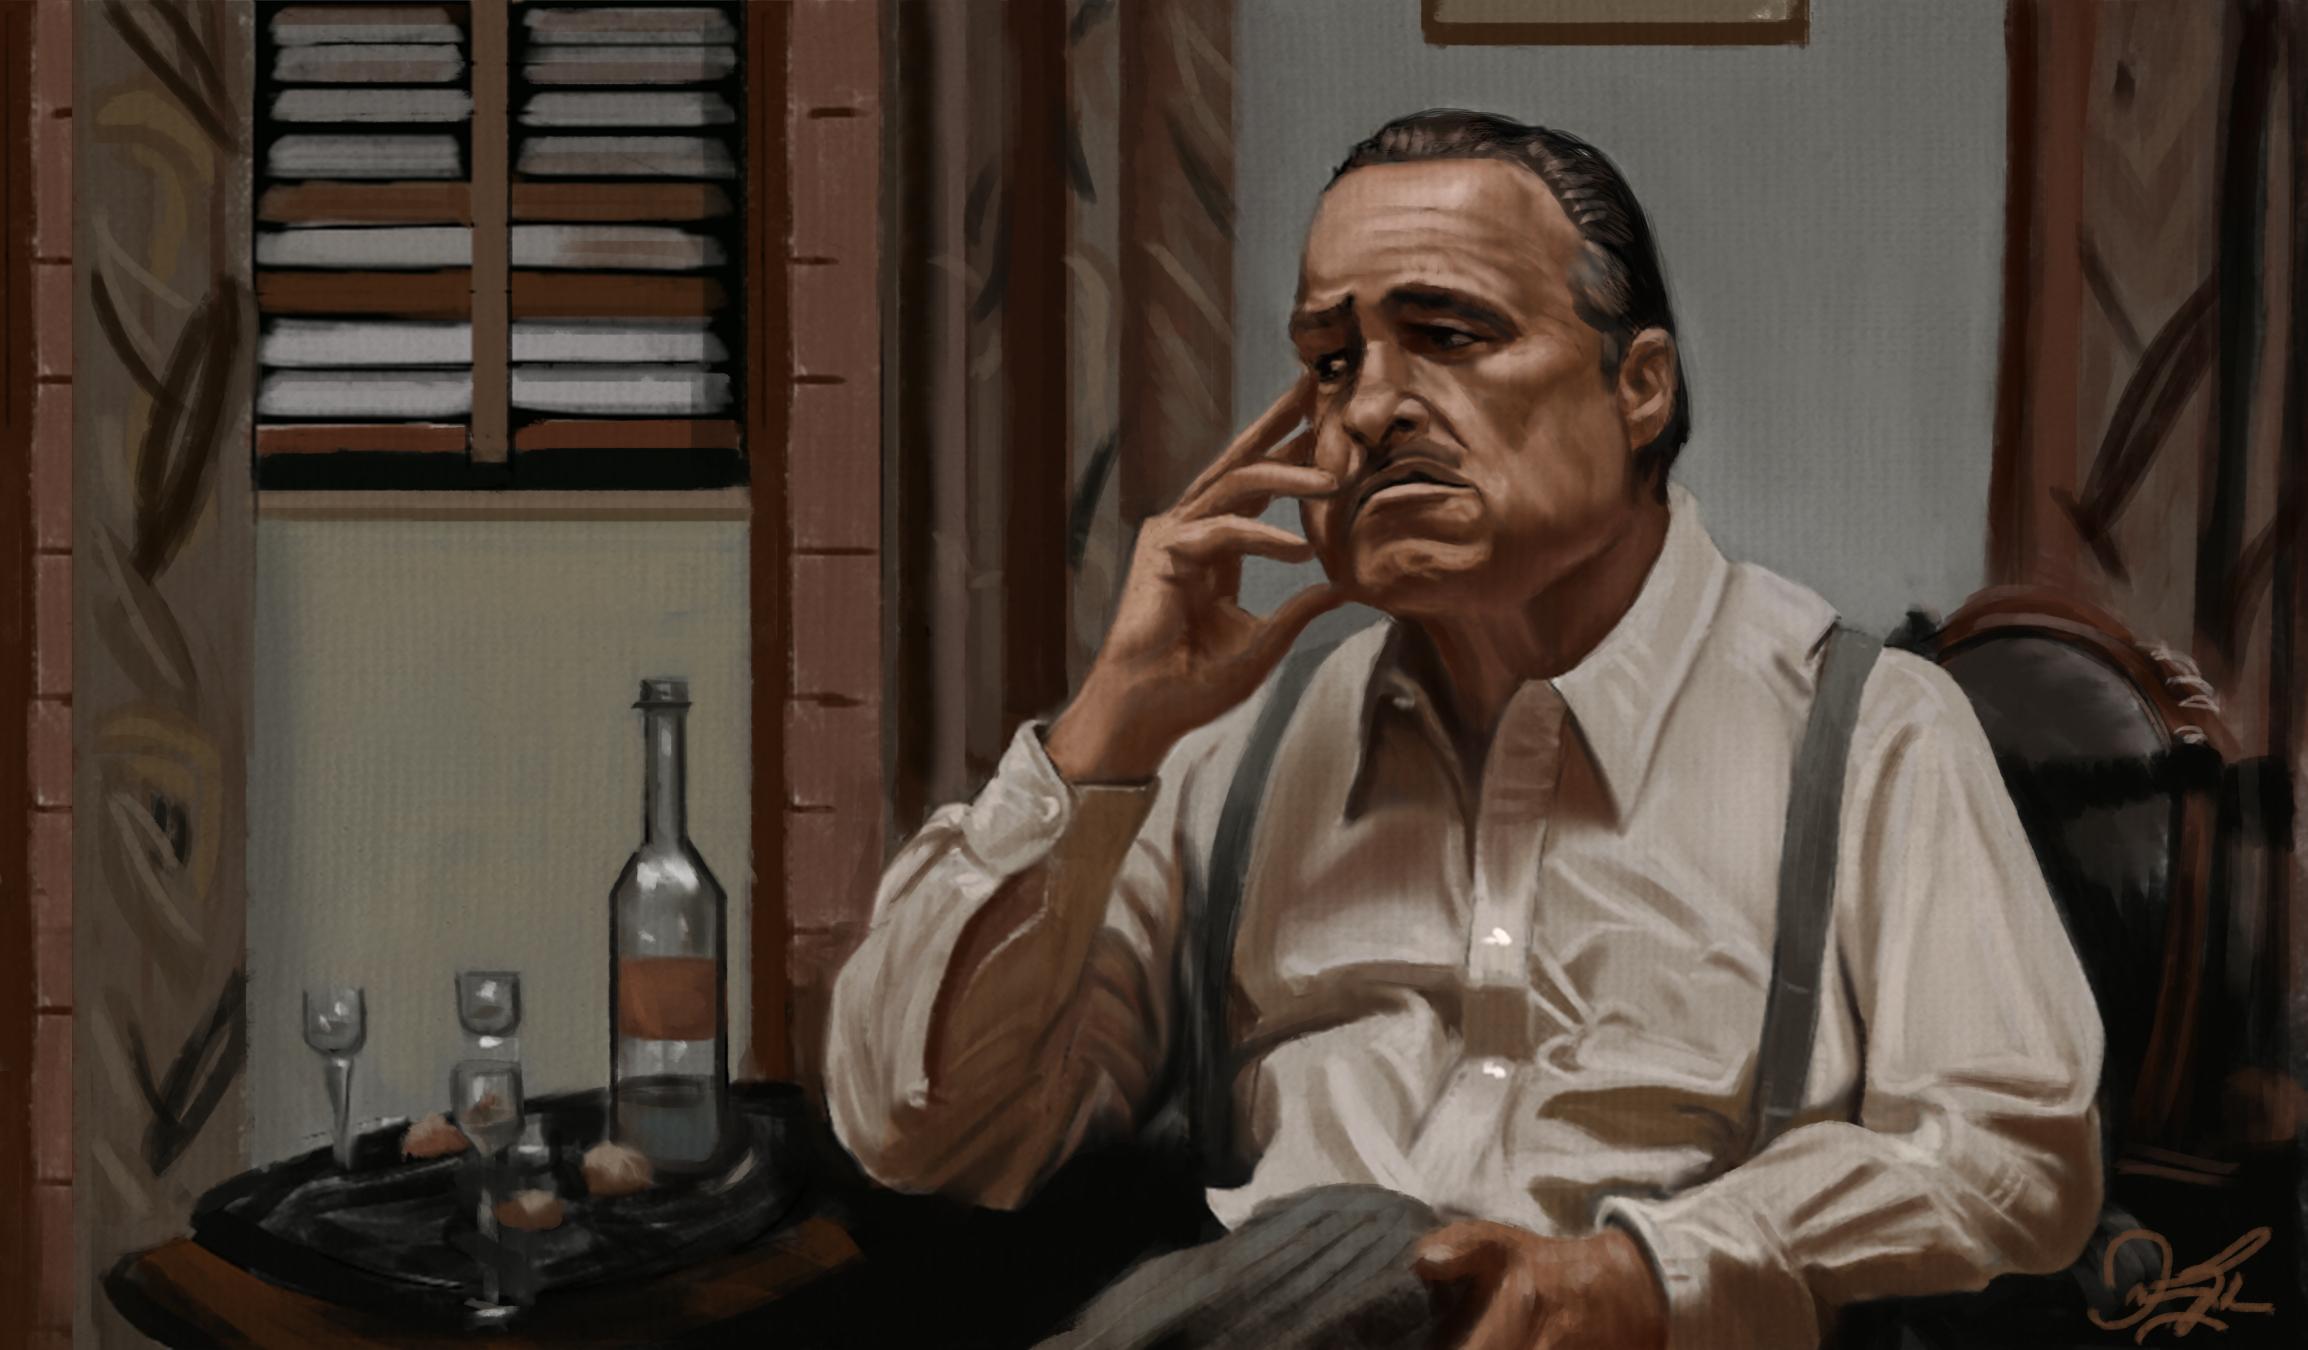 The-Godfather-11.jpg